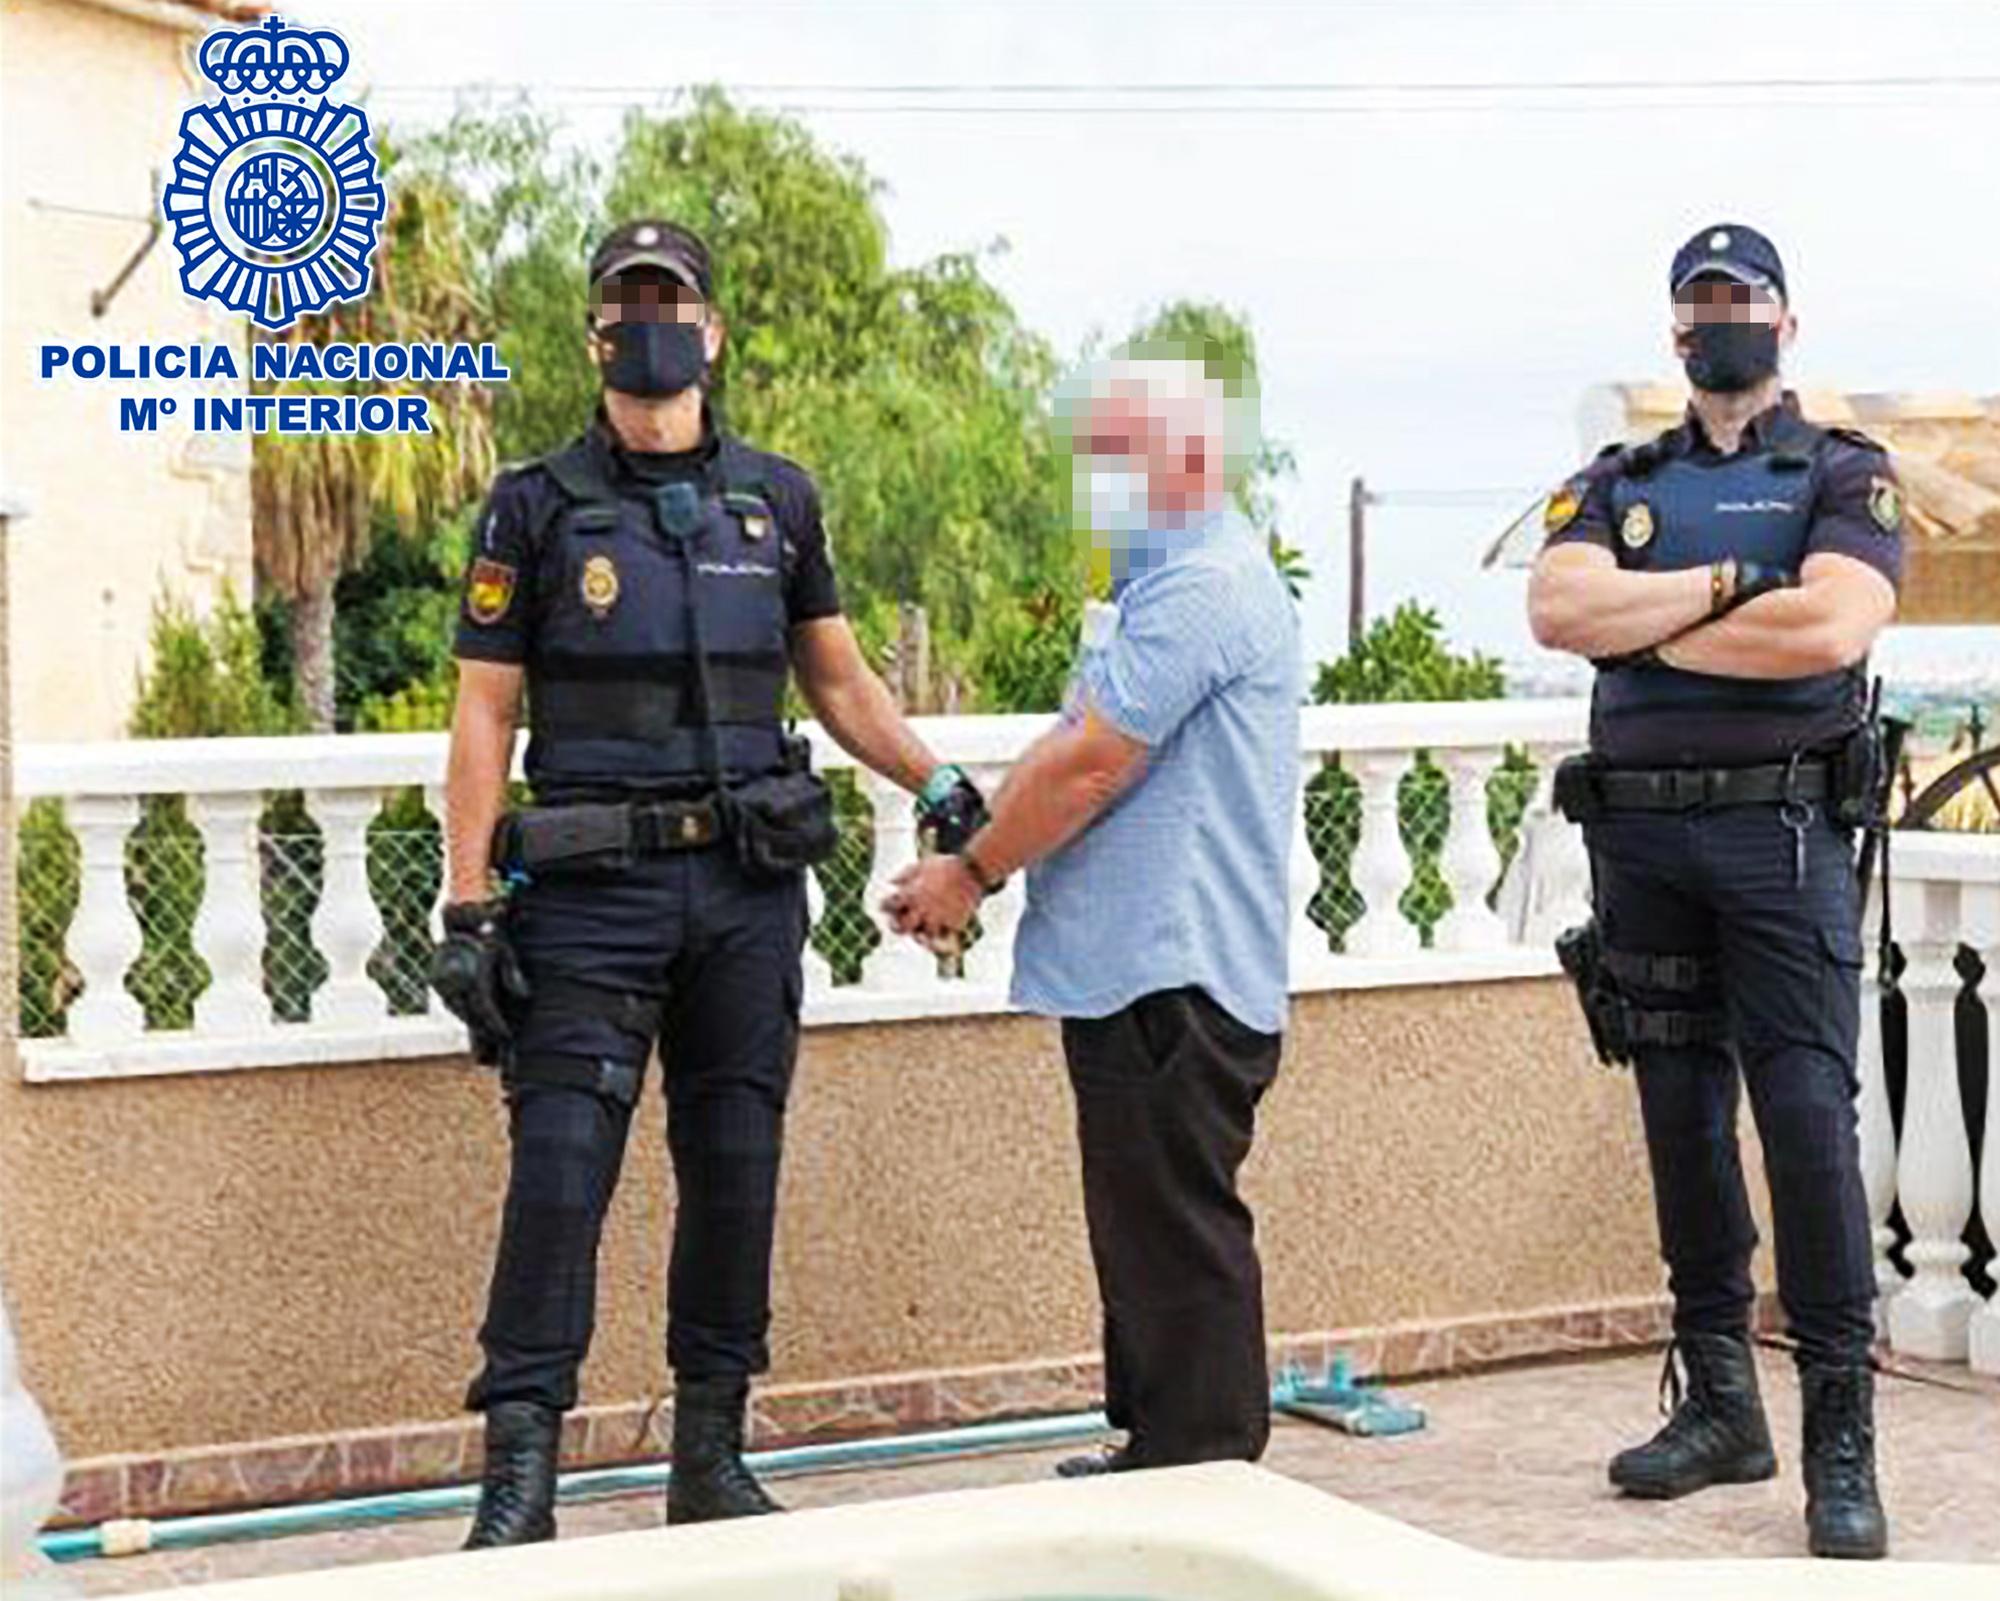 Irish Crime Boss Linked To 1996 Dublin Murder Arrested In Spain